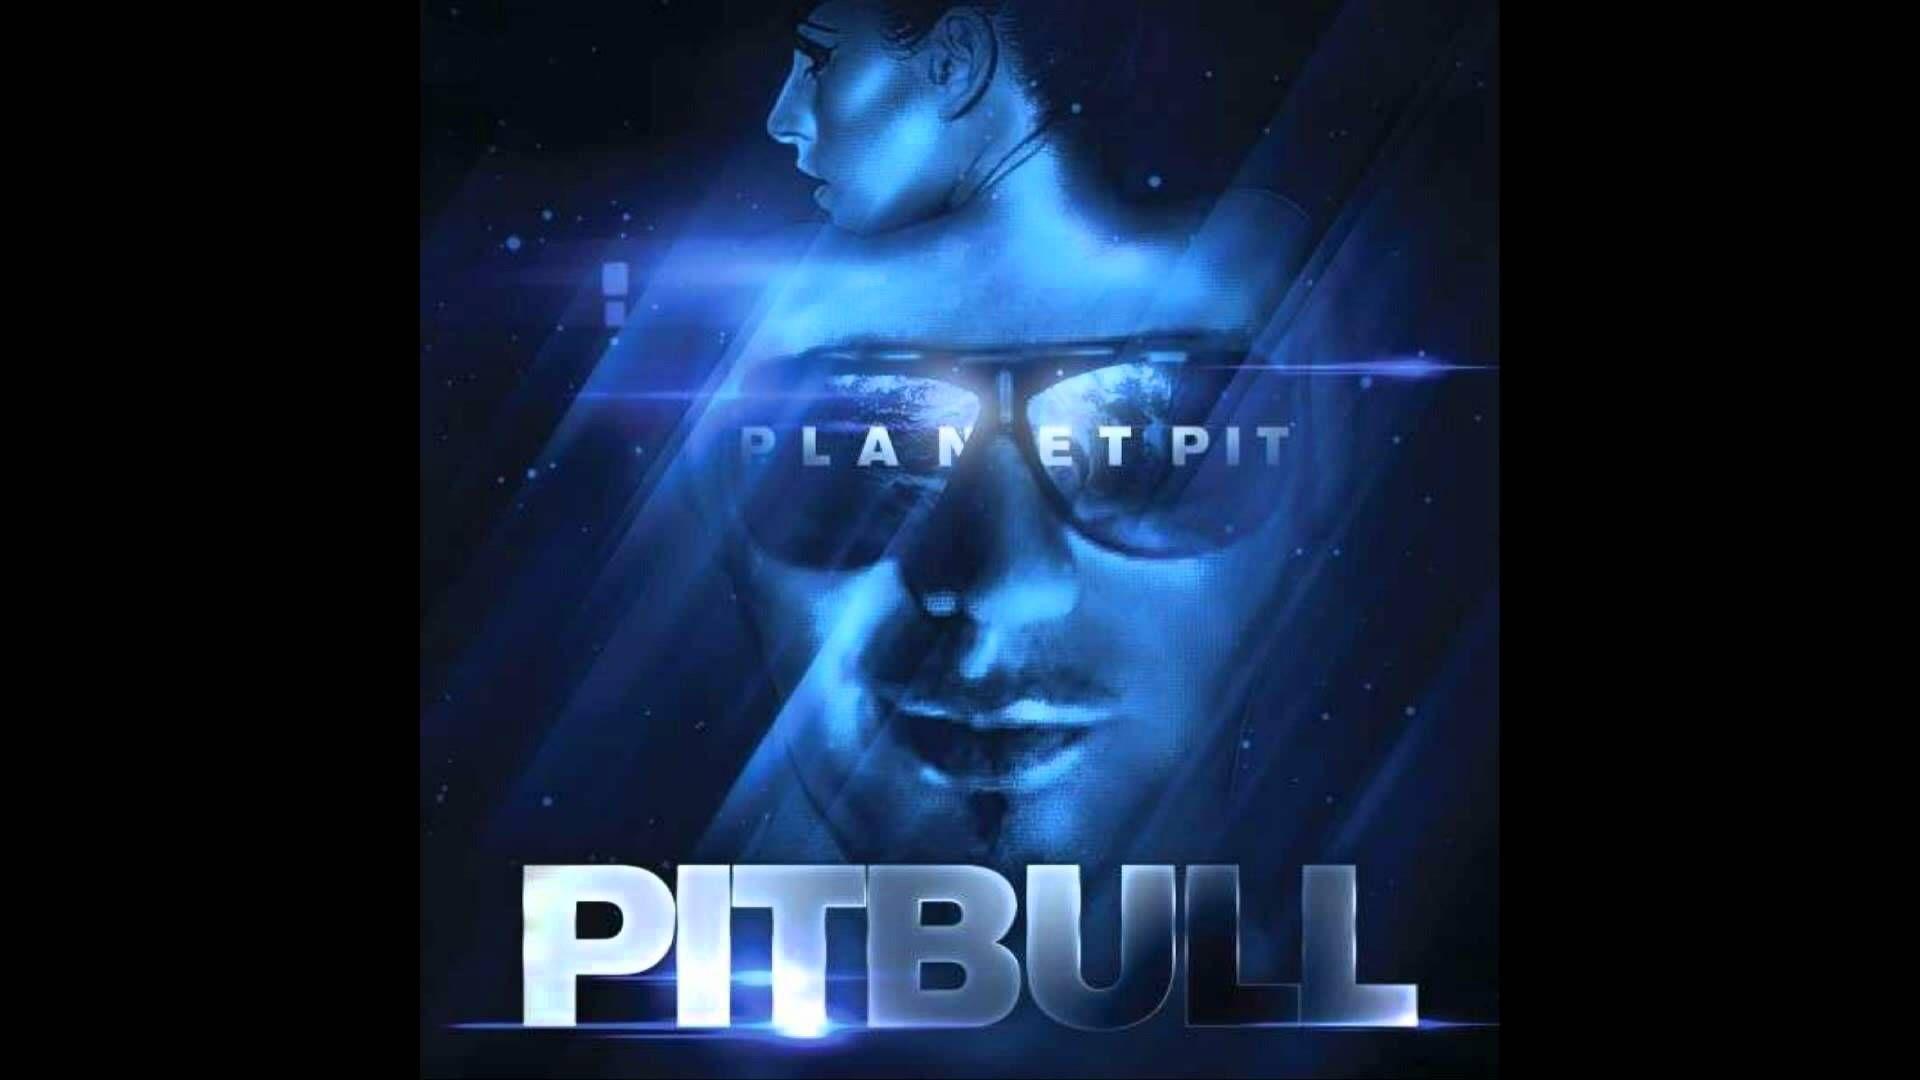 Pitbull - Planet Pit - International Love (Feat  Chris Brown